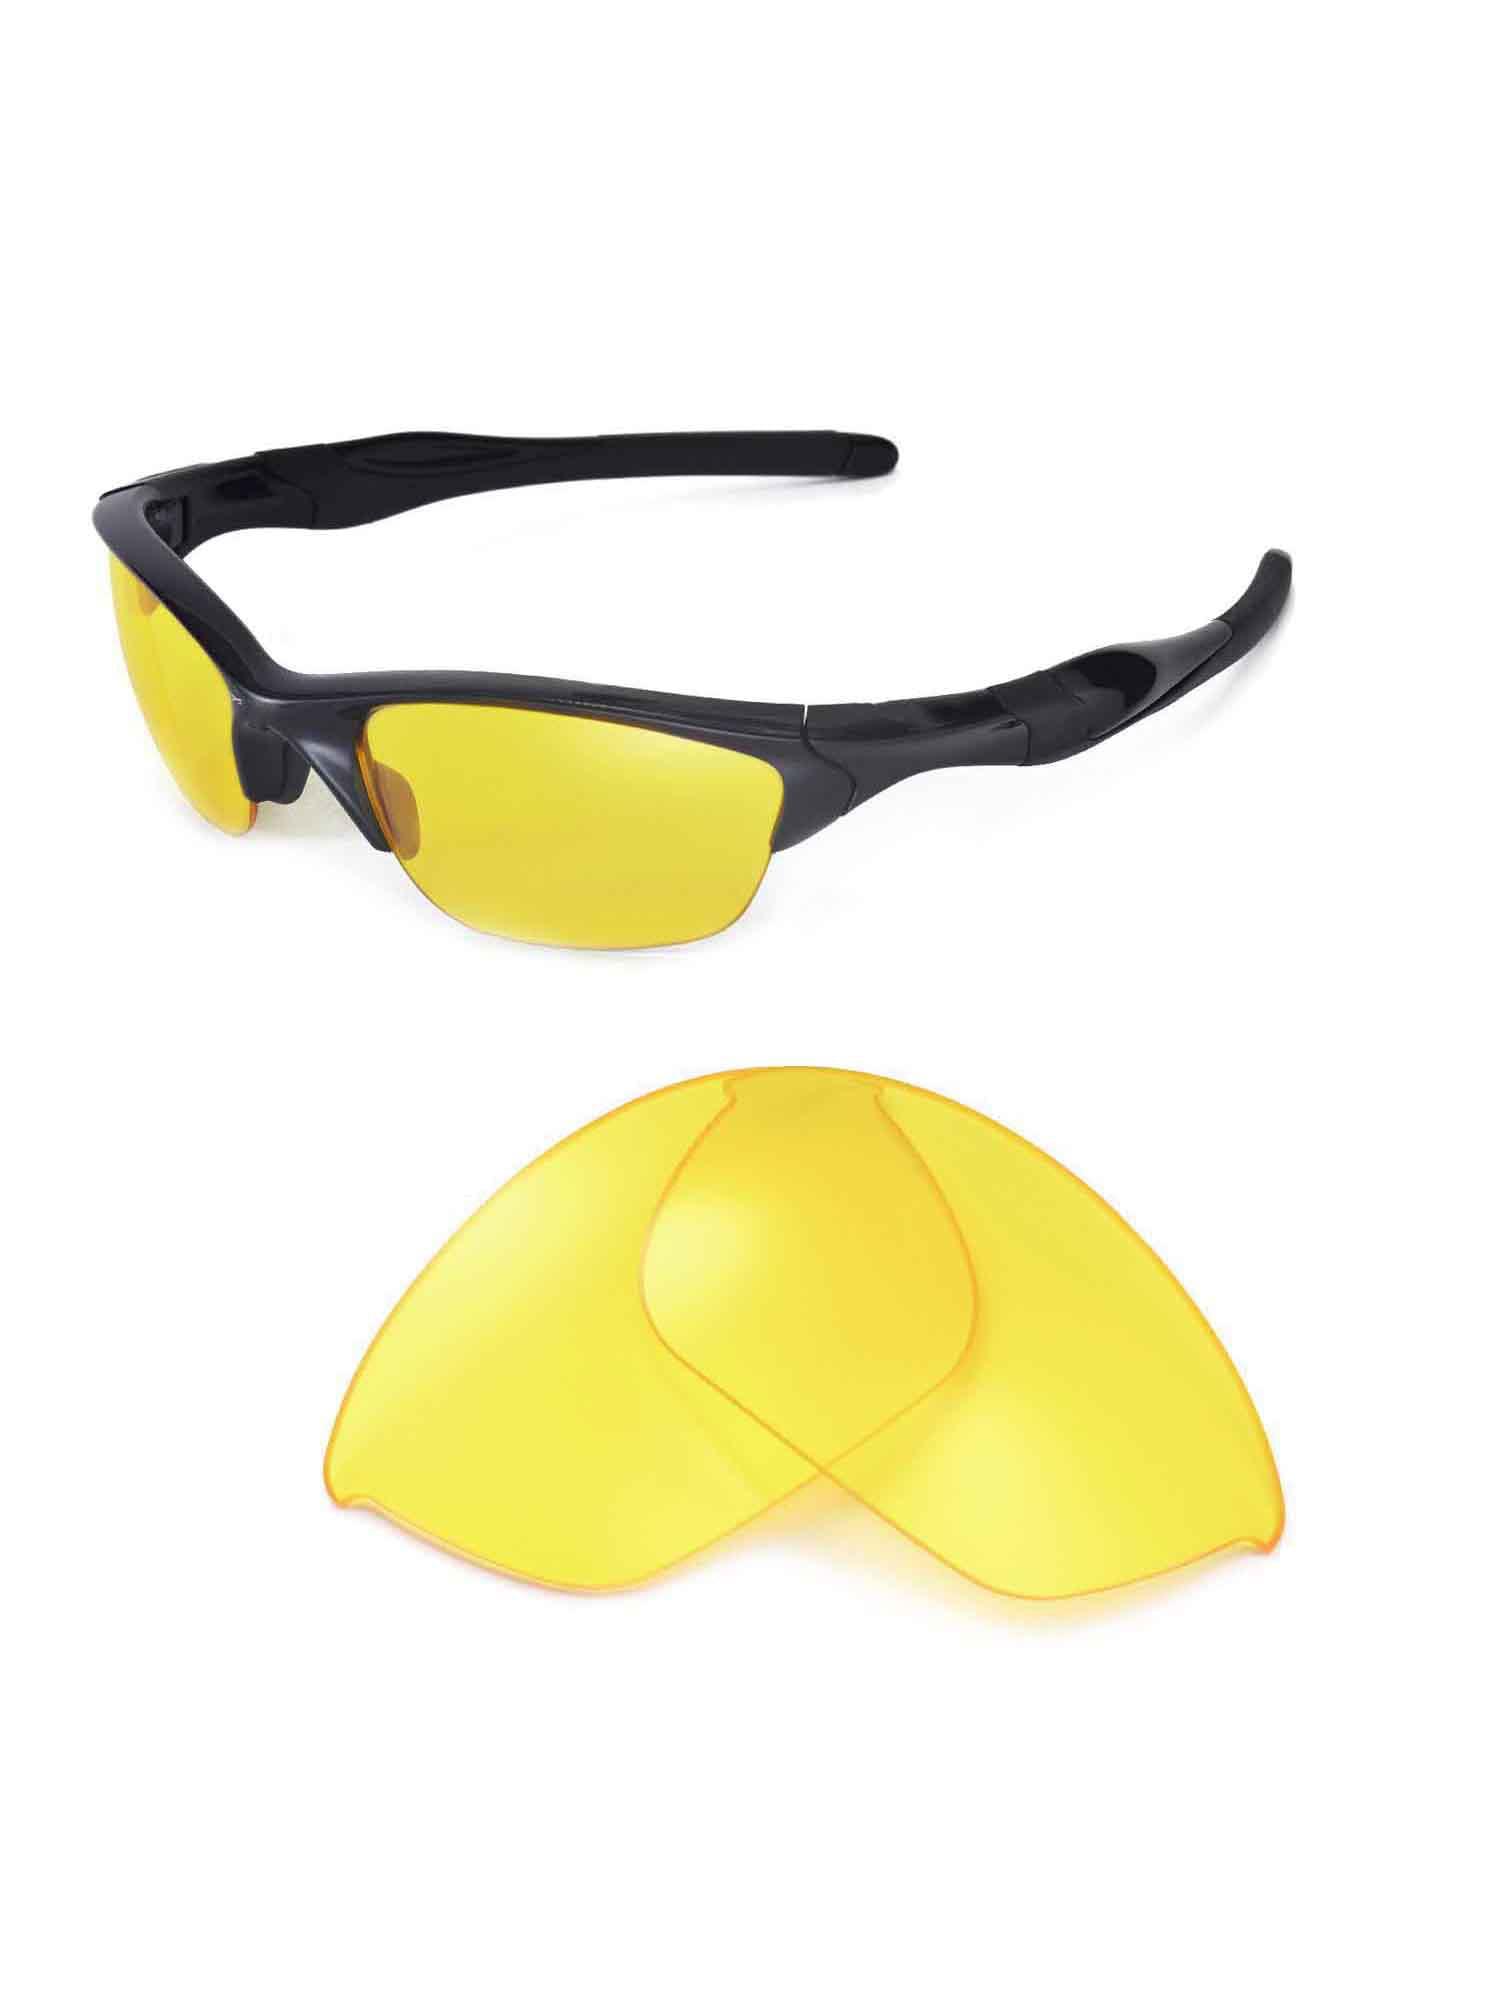 4207614ebe Walleva - Walleva 24K Gold Polarized Replacement Lenses for Oakley Half  Jacket 2.0 Sunglasses - Walmart.com